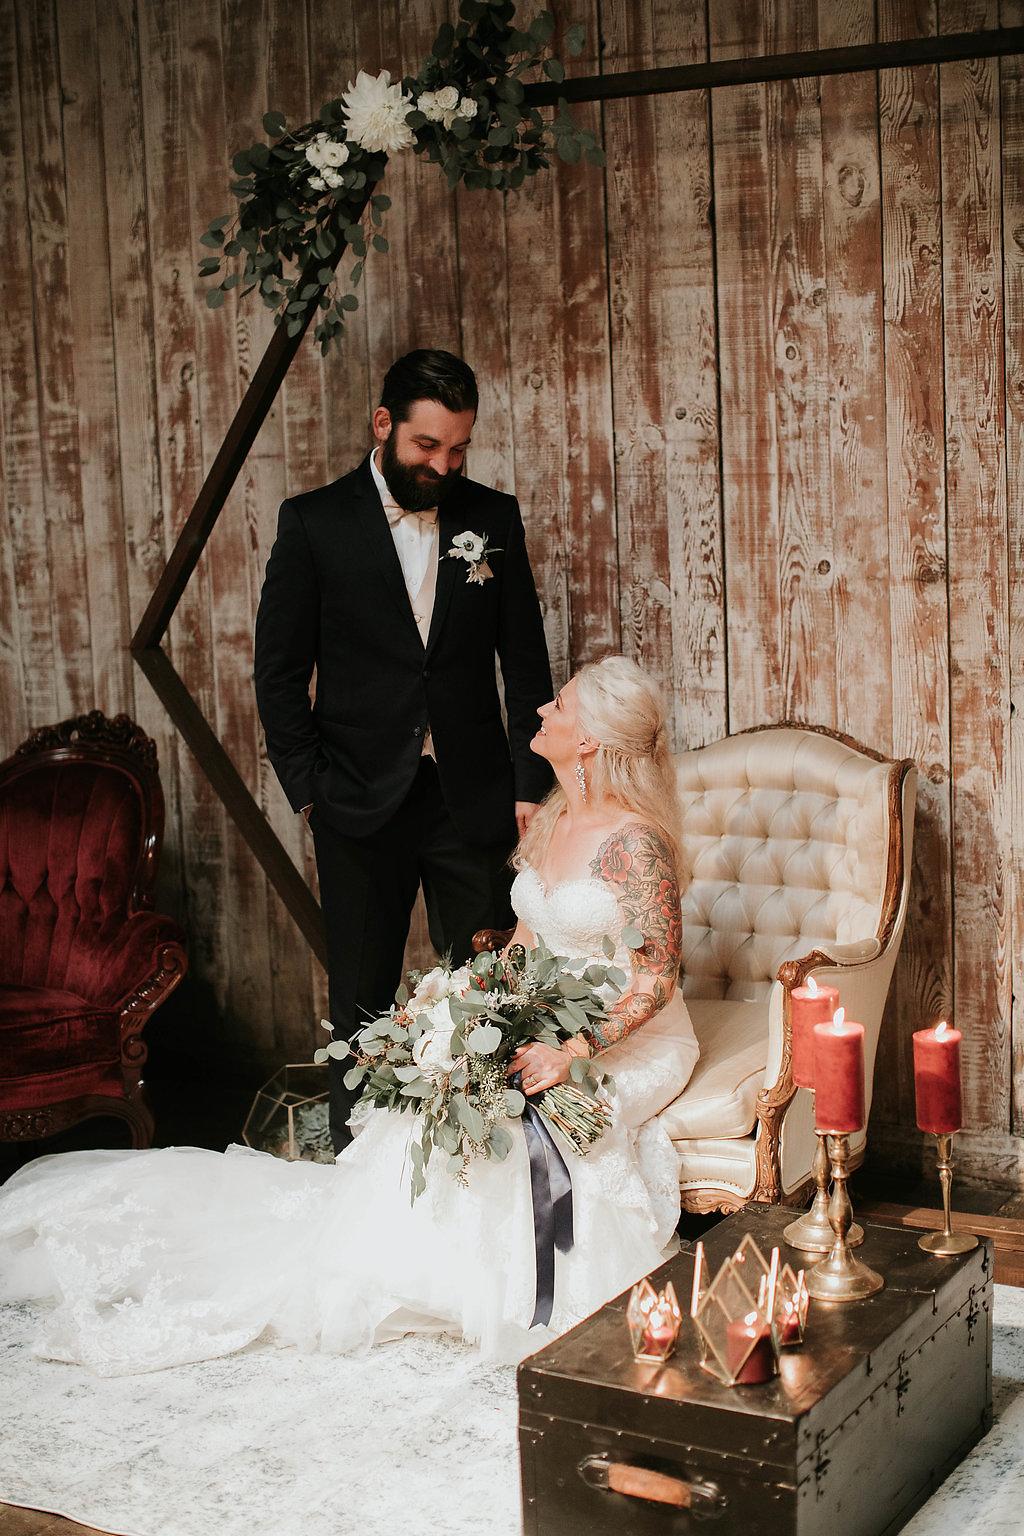 The_Big_Fake_wedding_Seattle_Within_sodo_wedding_by_Adina_Preston_Weddings_165.JPG